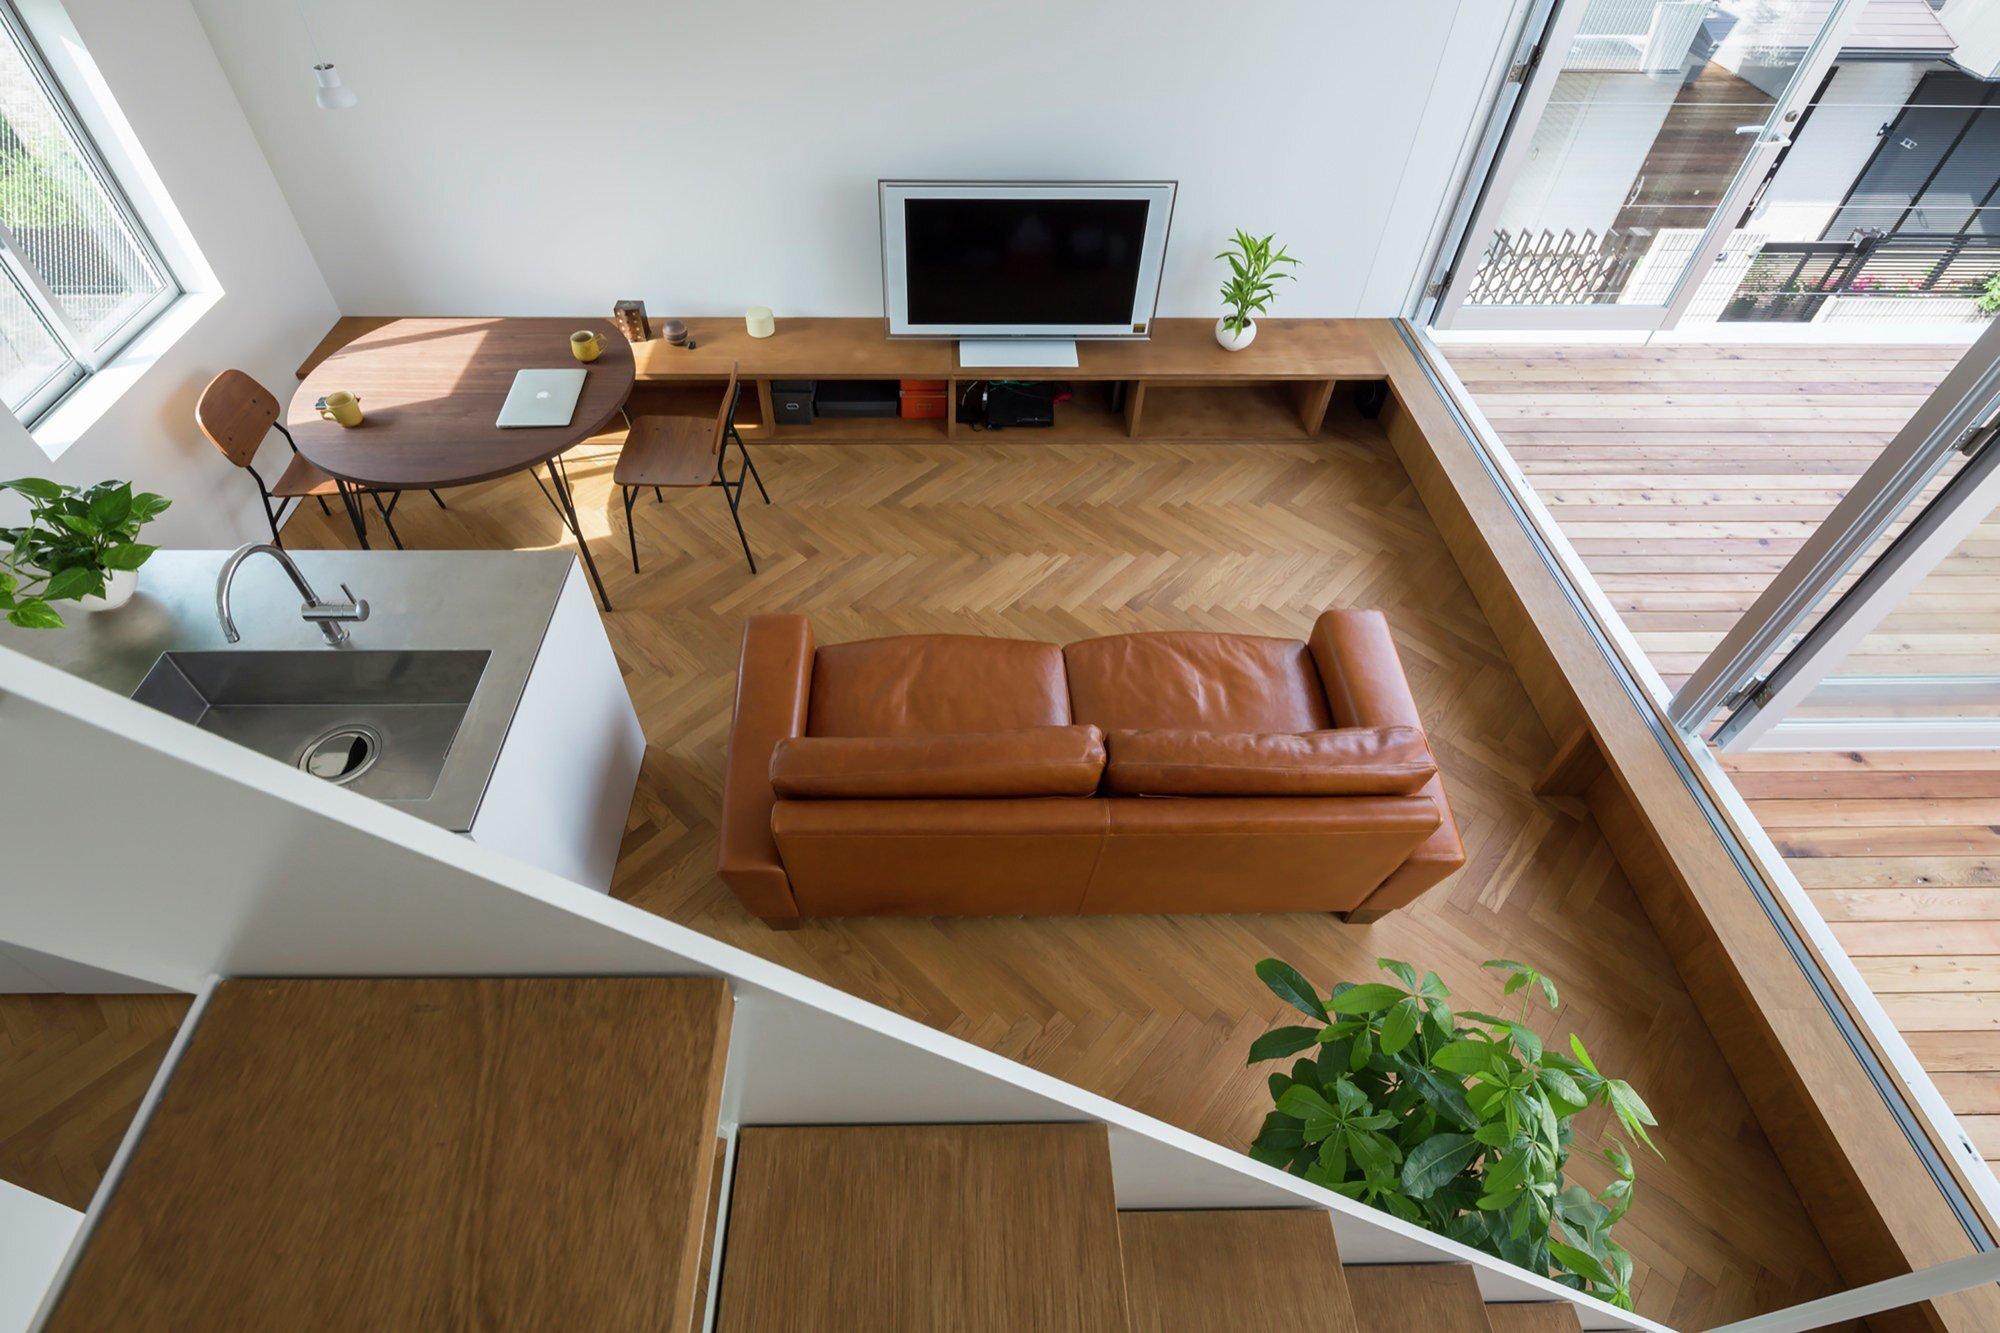 Little House with a Big Terrace - Takuro Yamamoto - Tokyo - Living Area - Humble Homes